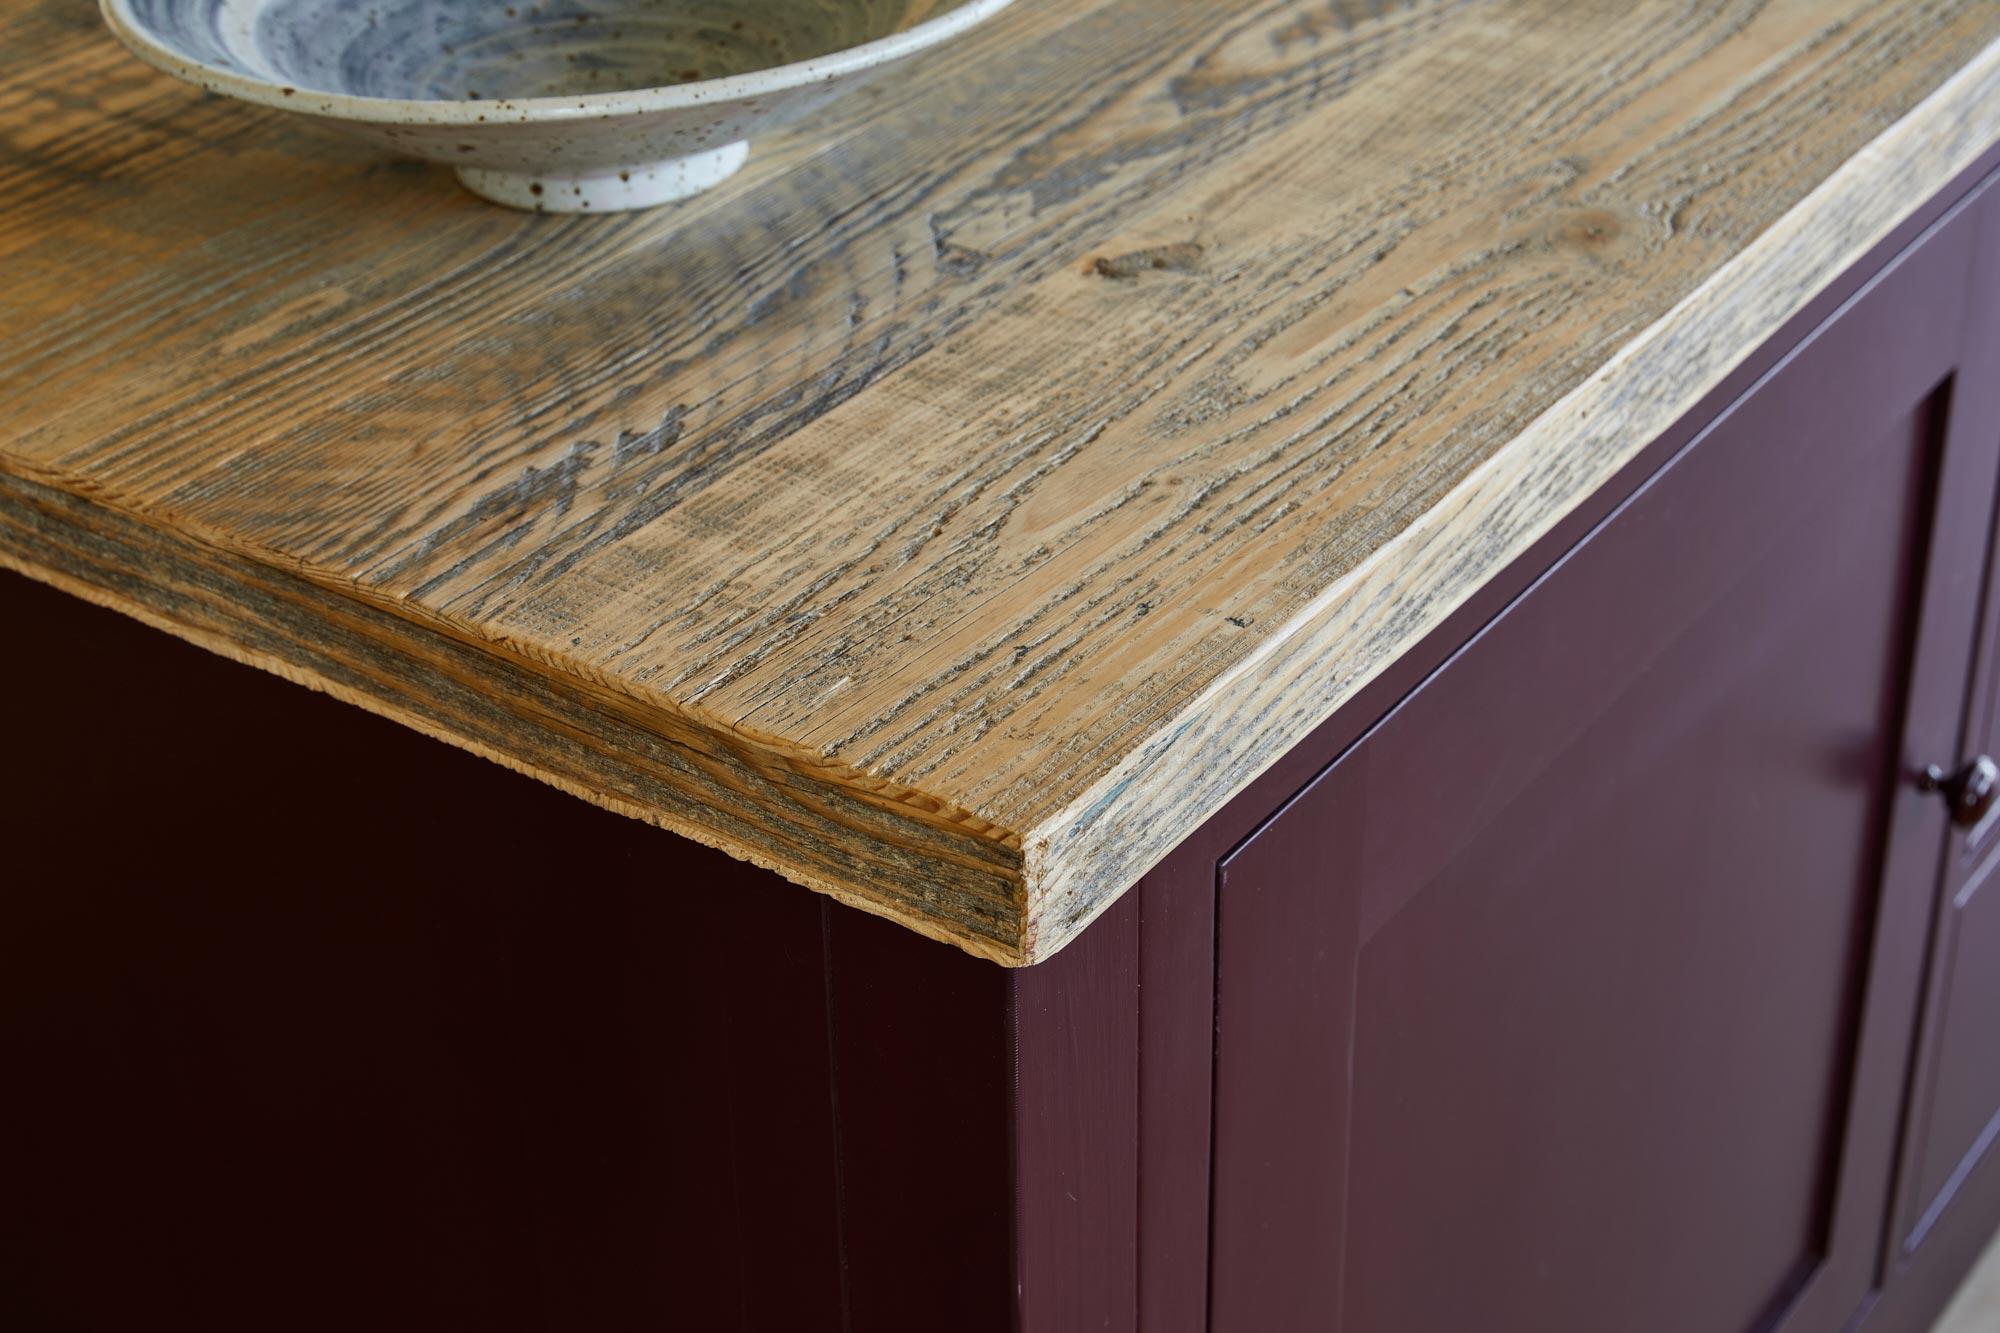 Reclaimed engineered spruce wood kitchen worktop